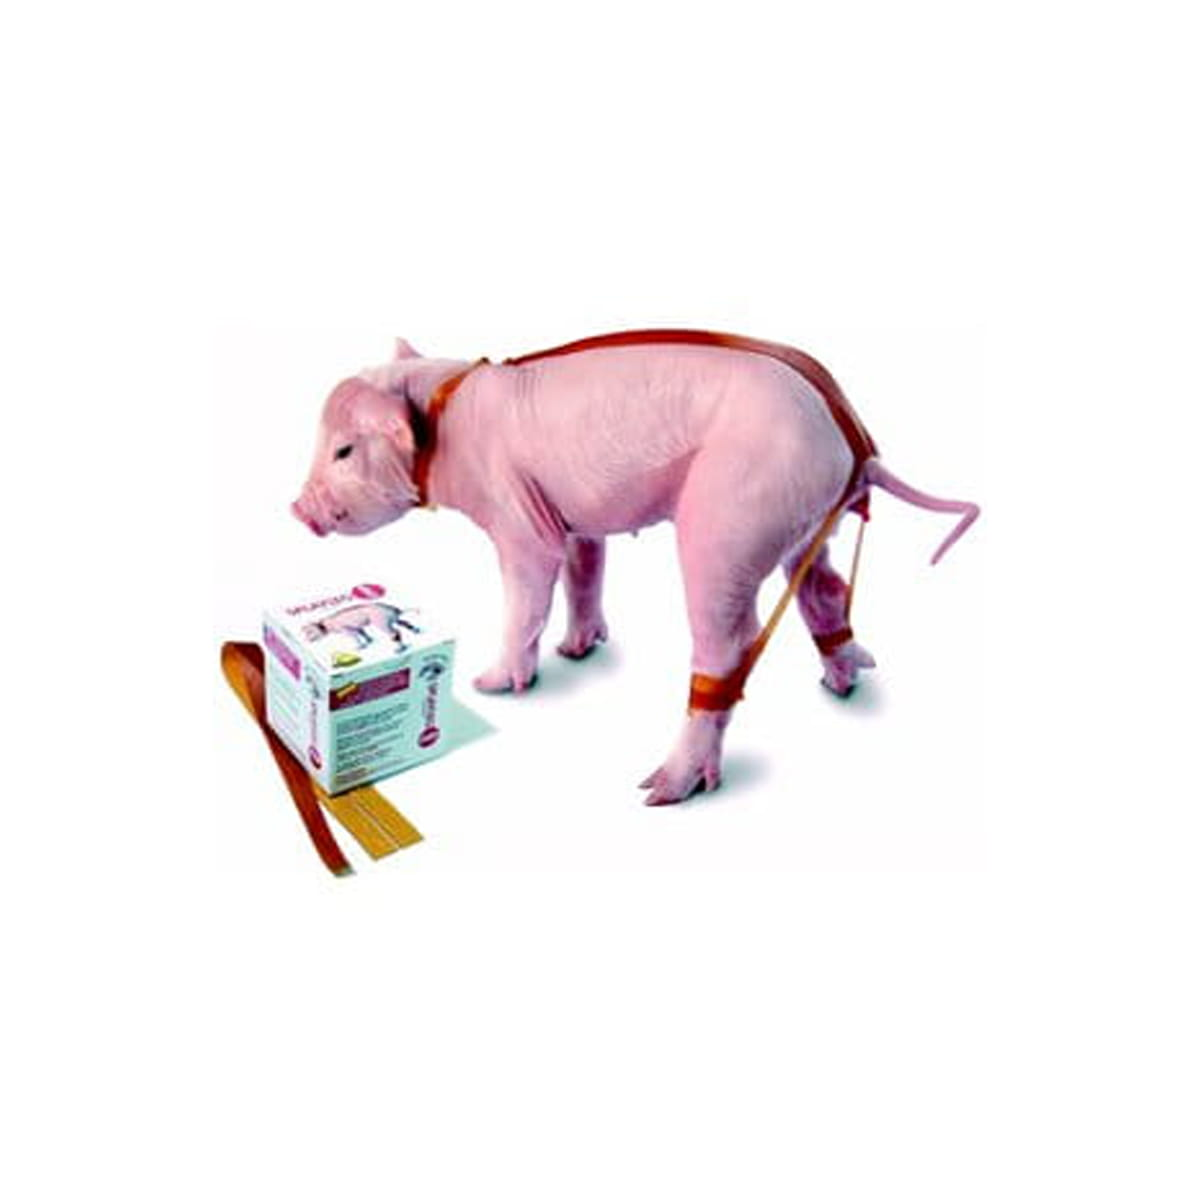 Splayleg correa para cerdo enfermo